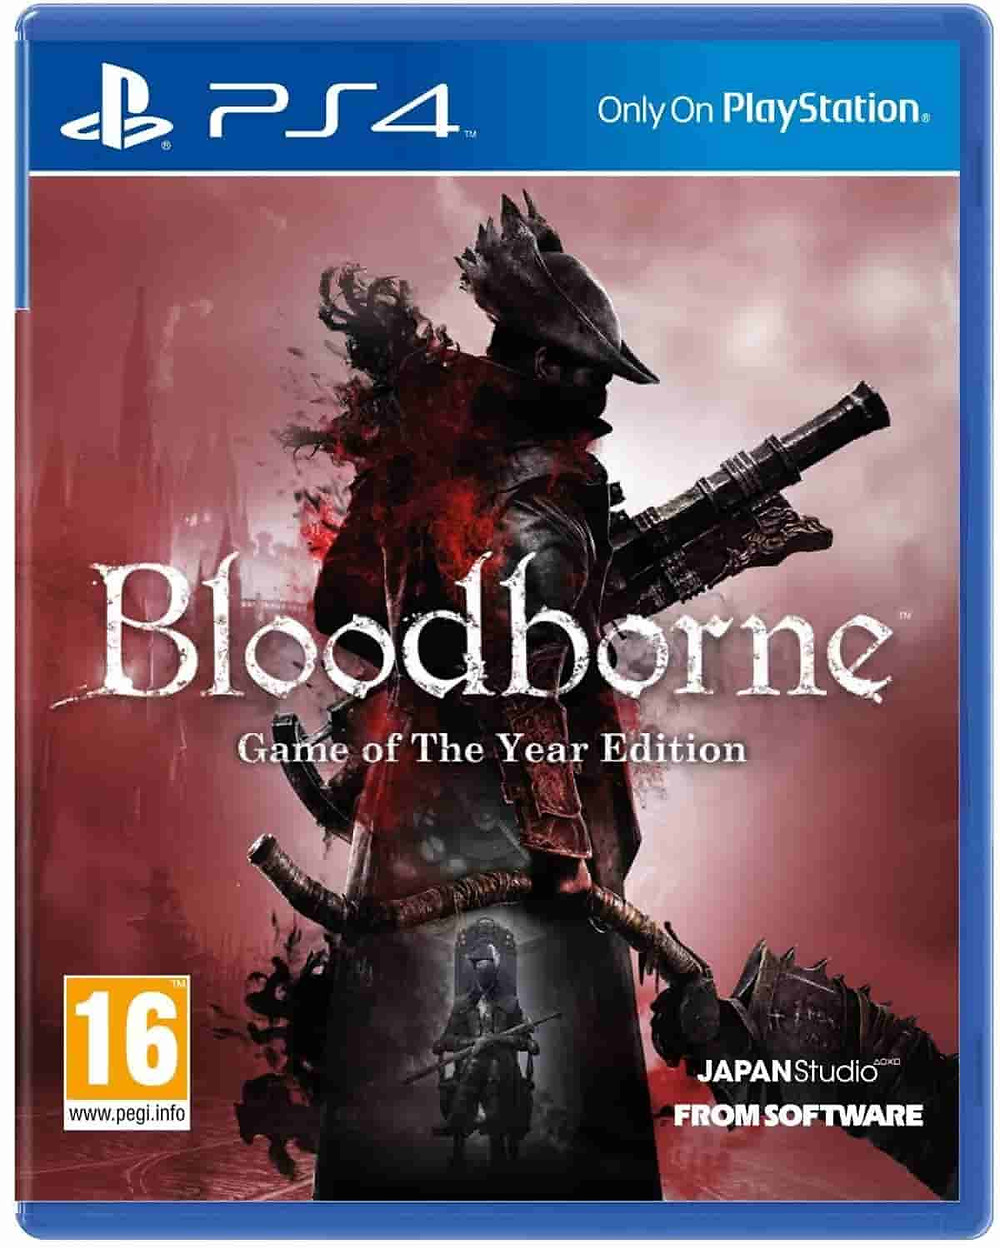 Juego imprescindible ps4: Bloodborne